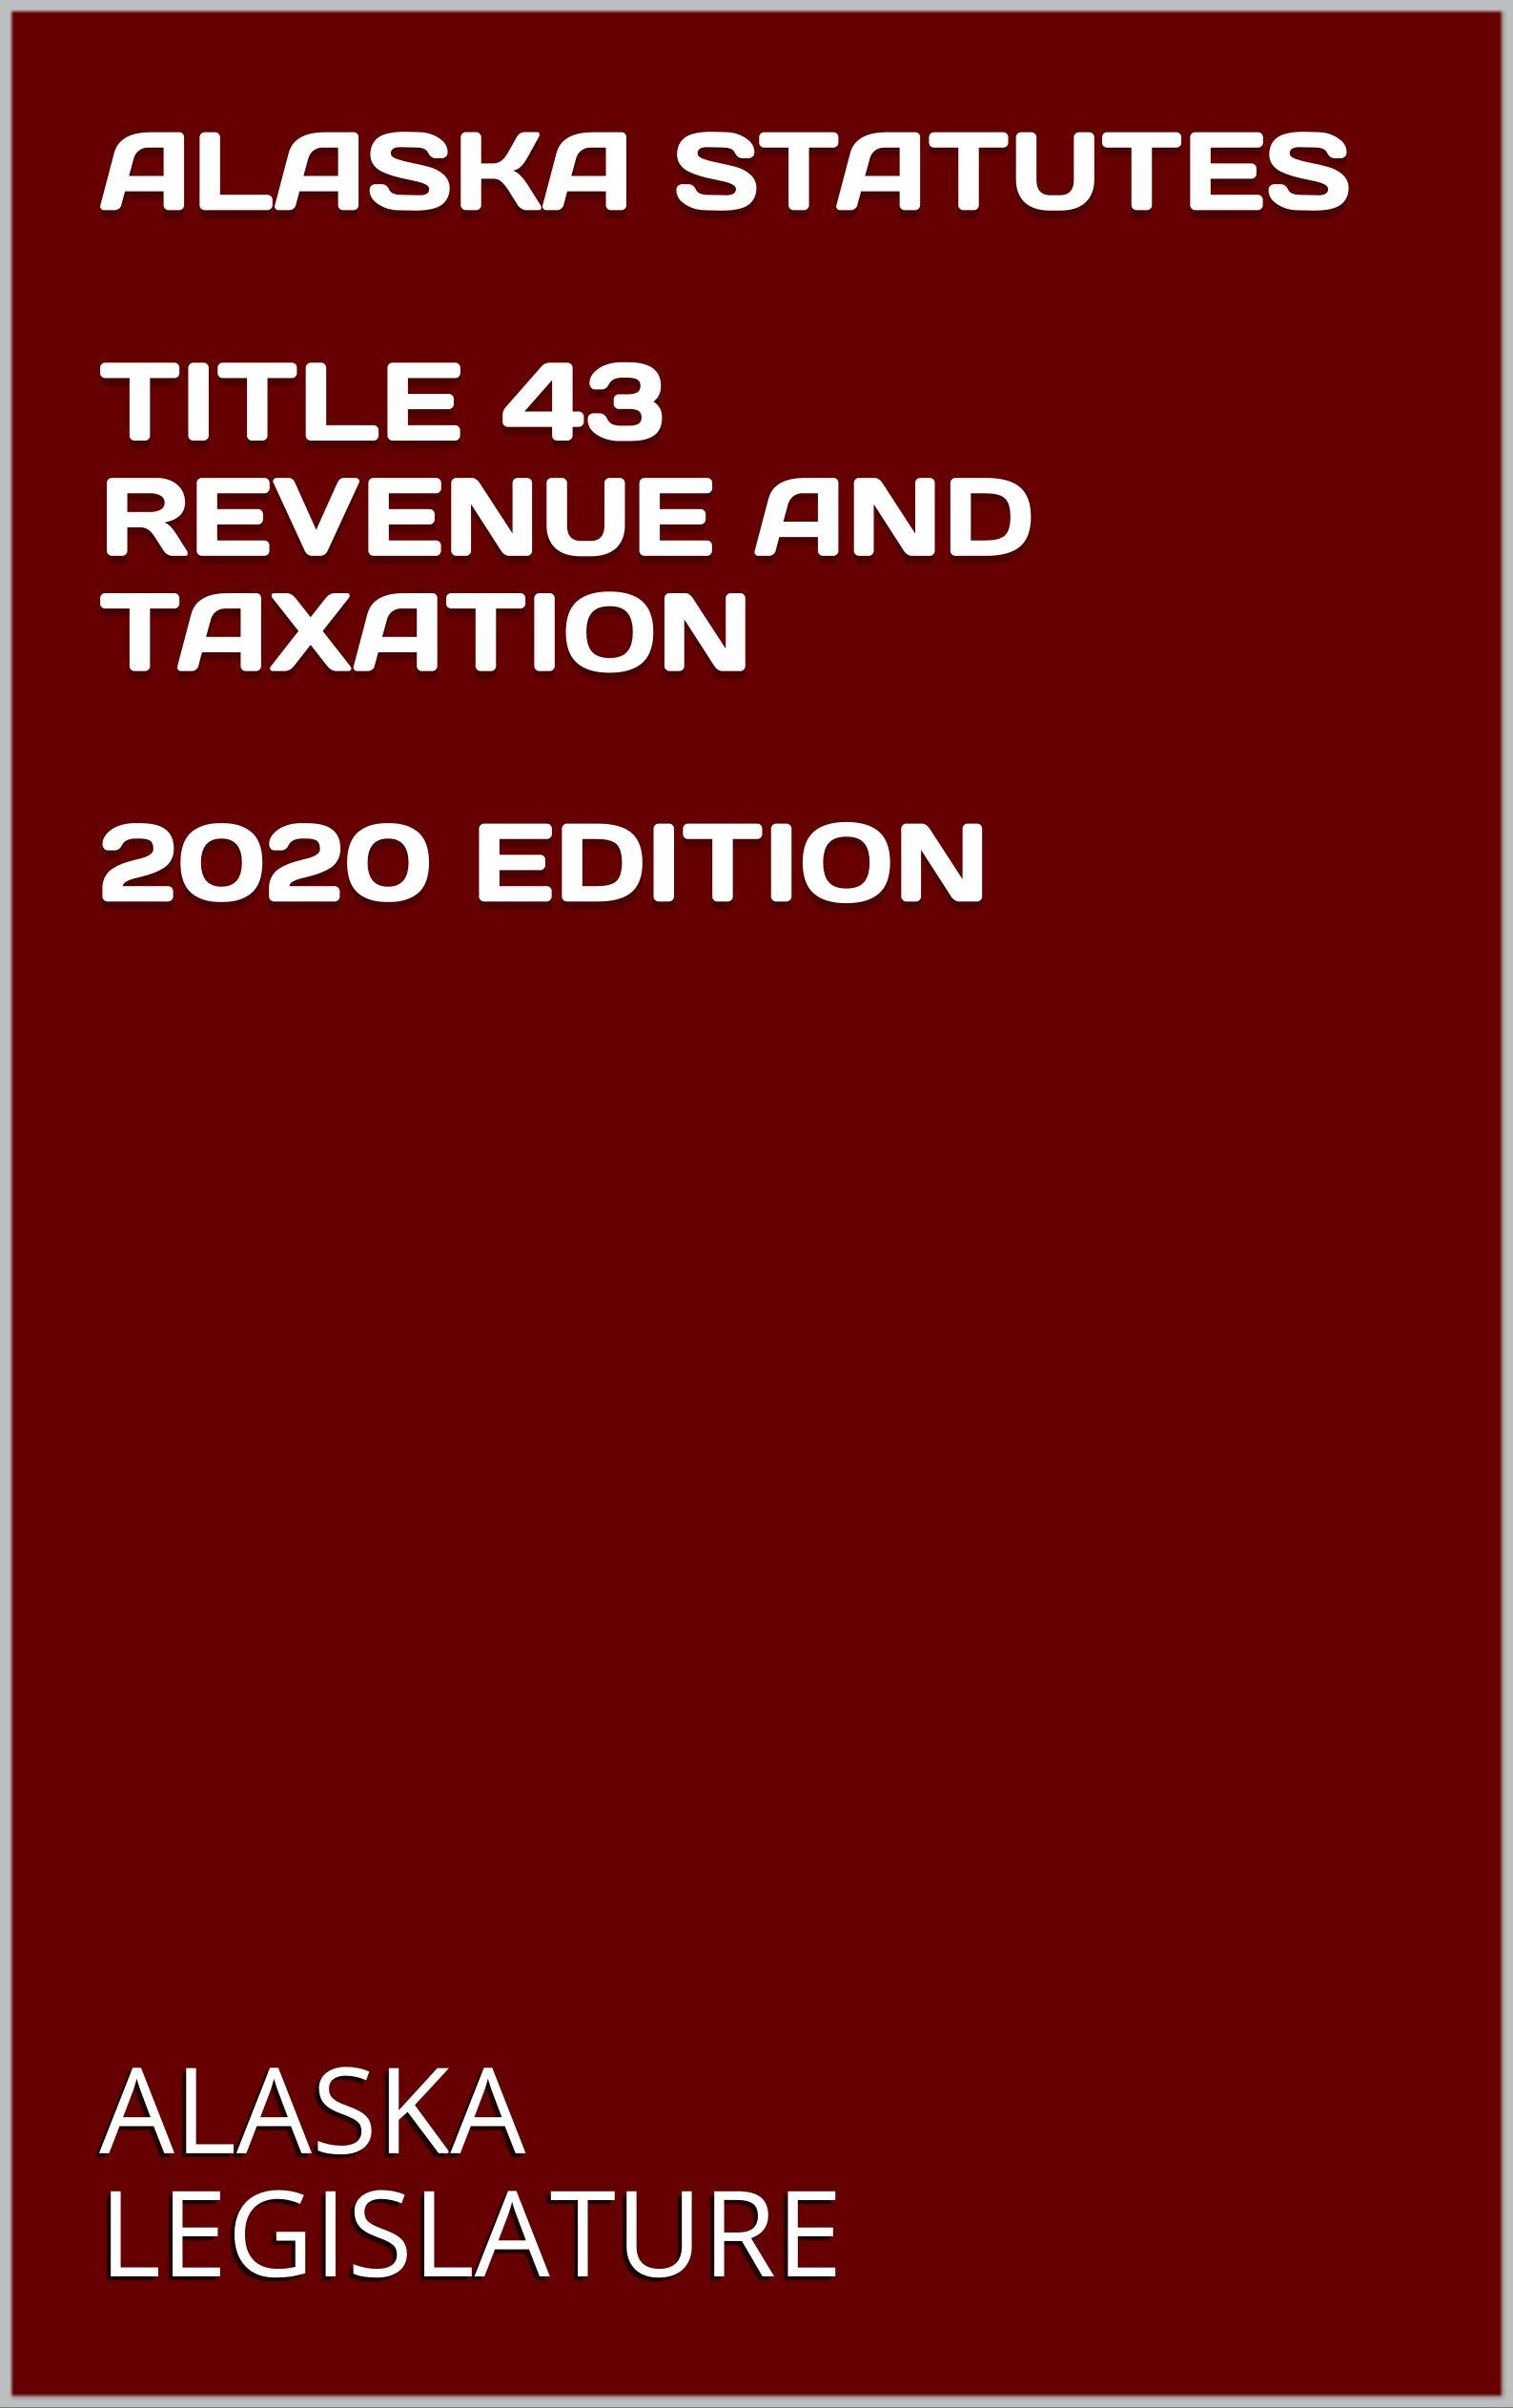 ALASKA STATUTES TITLE 43 REVENUE AND TAXATION 2020 EDITION